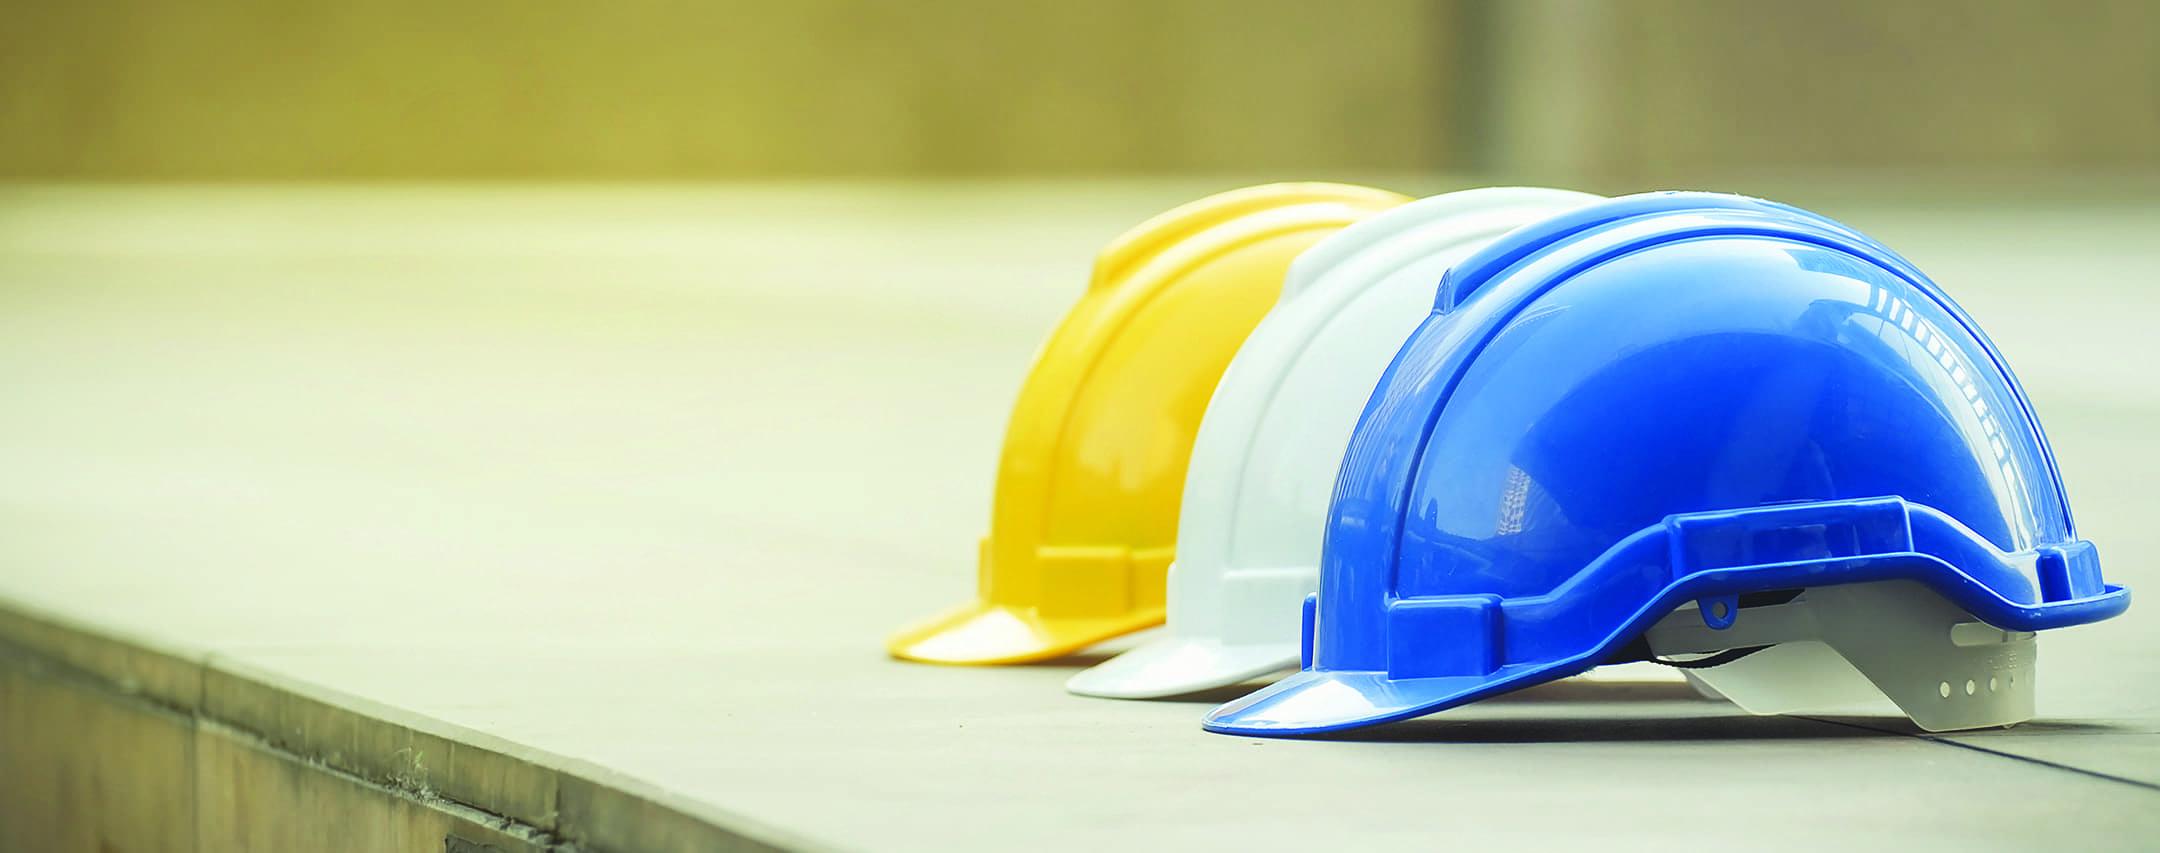 three hard construction hats lined up